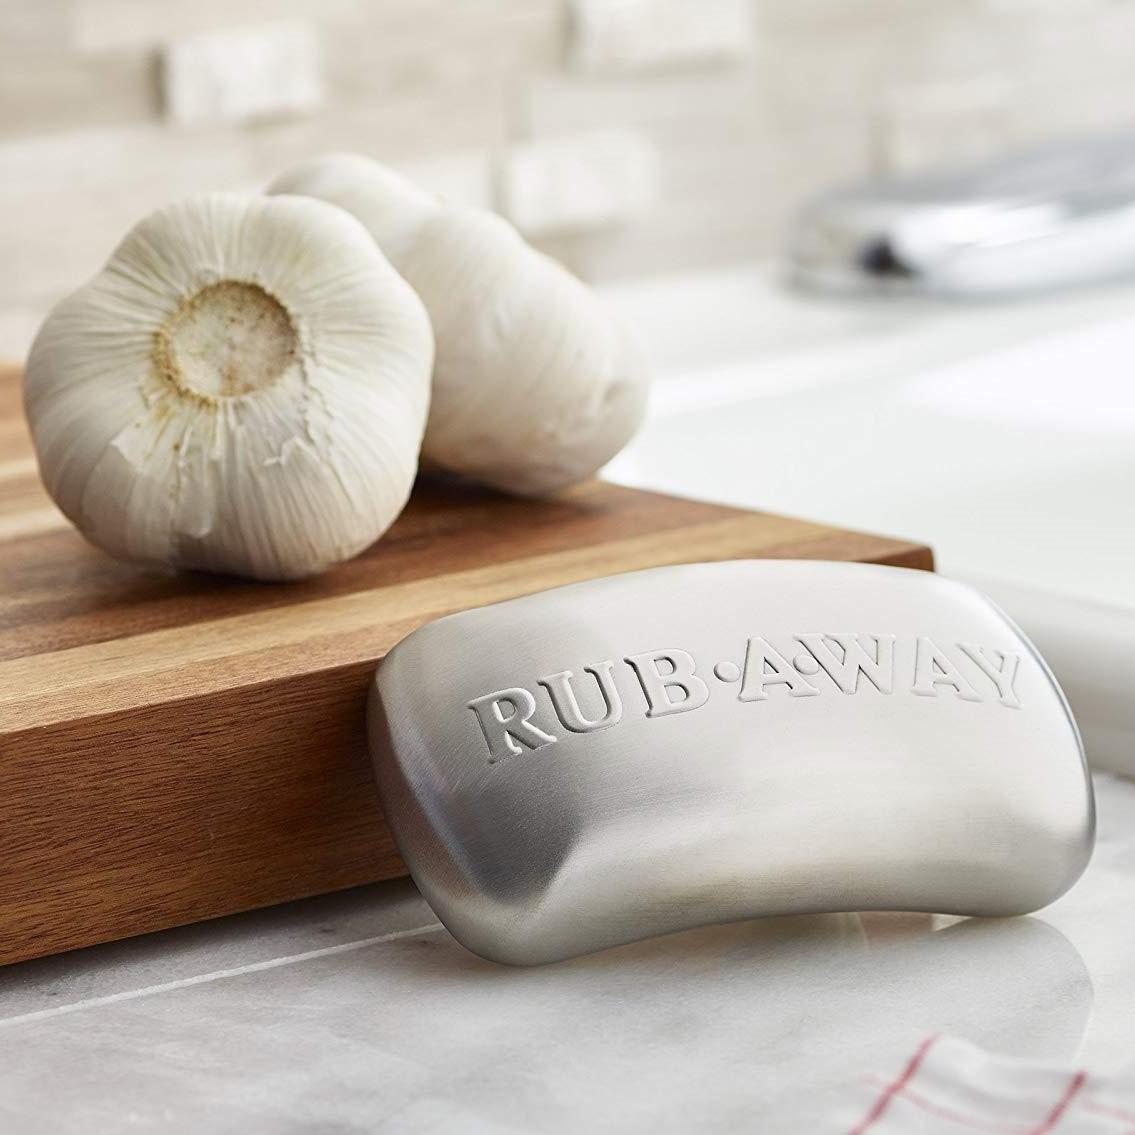 rub away garlic soap.jpg